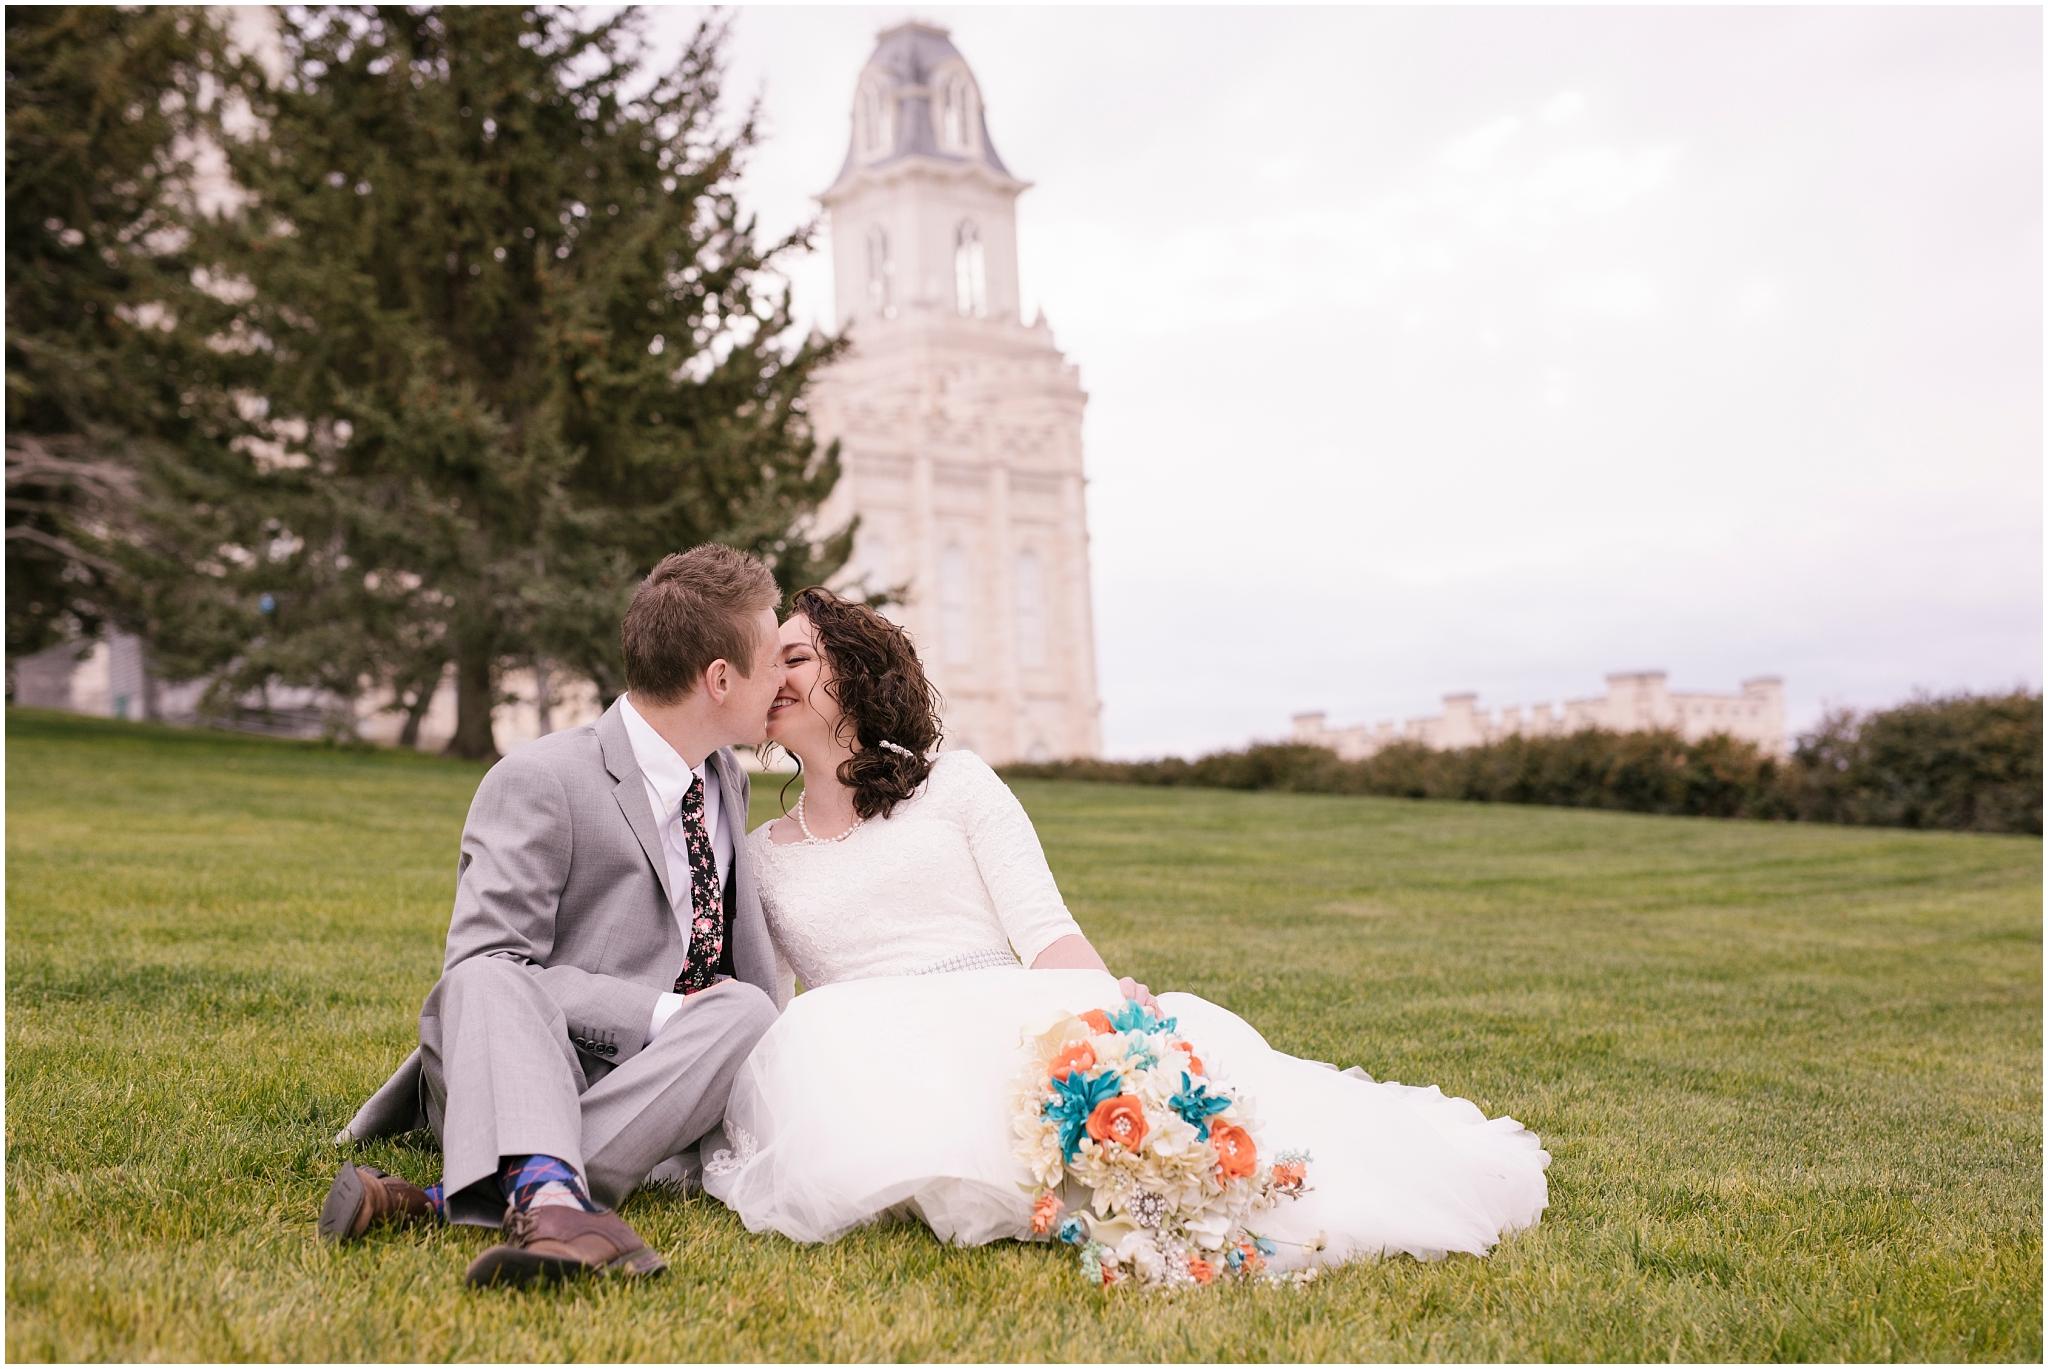 BA-Bridals-32_Lizzie-B-Imagery-Utah-Wedding-Photographer-Central-Utah-Photographer-Utah-County-Manti-Utah-Temple.jpg